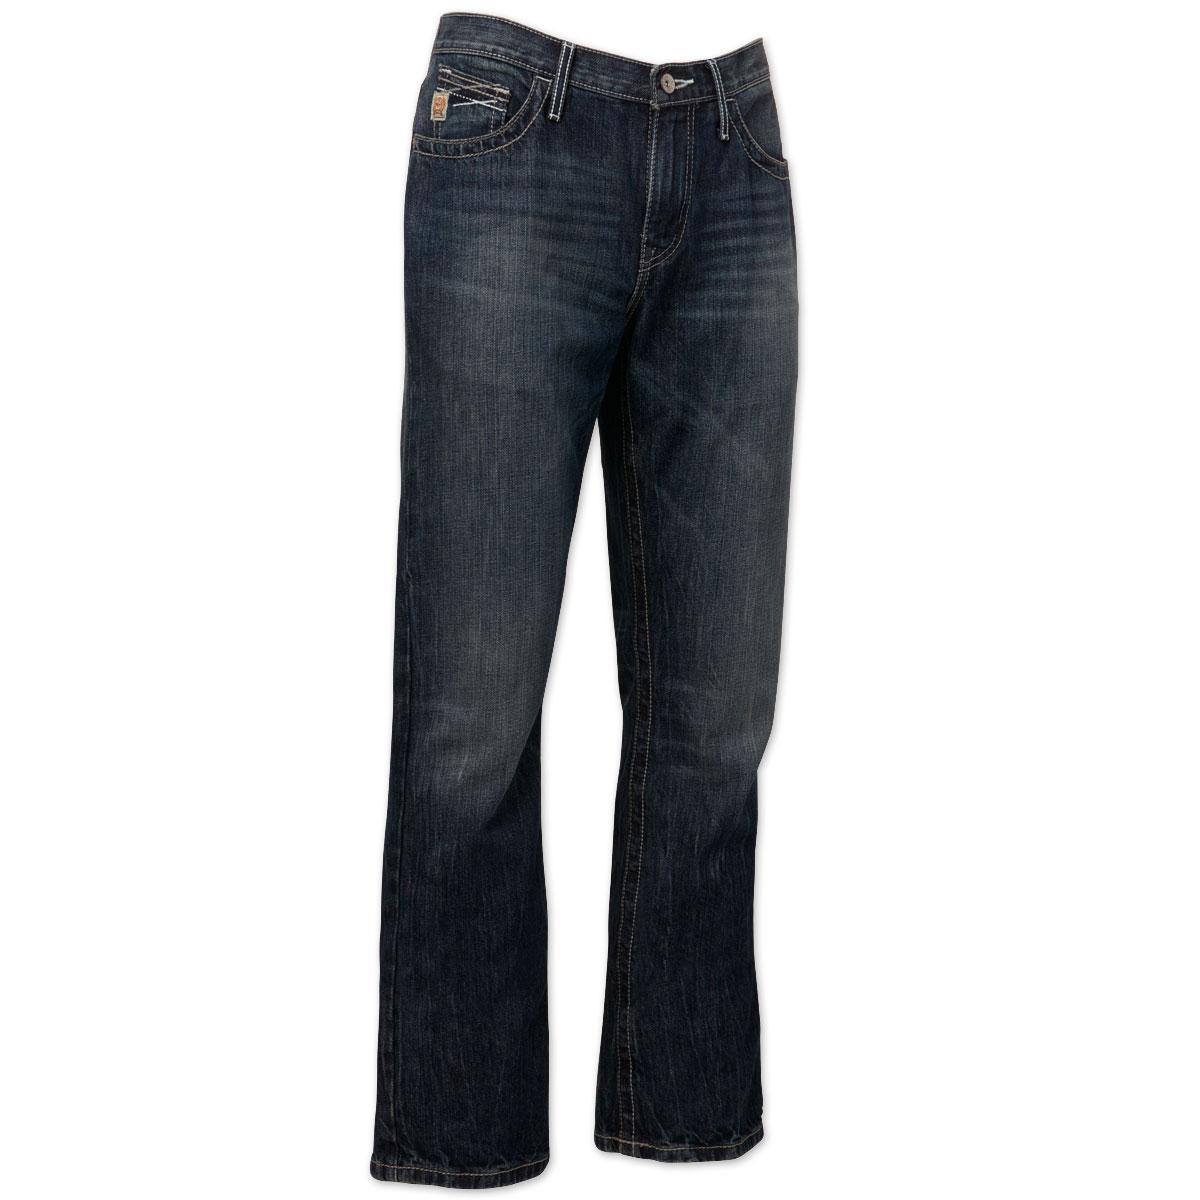 cc0ad60b Cinch Men's Ian Jeans